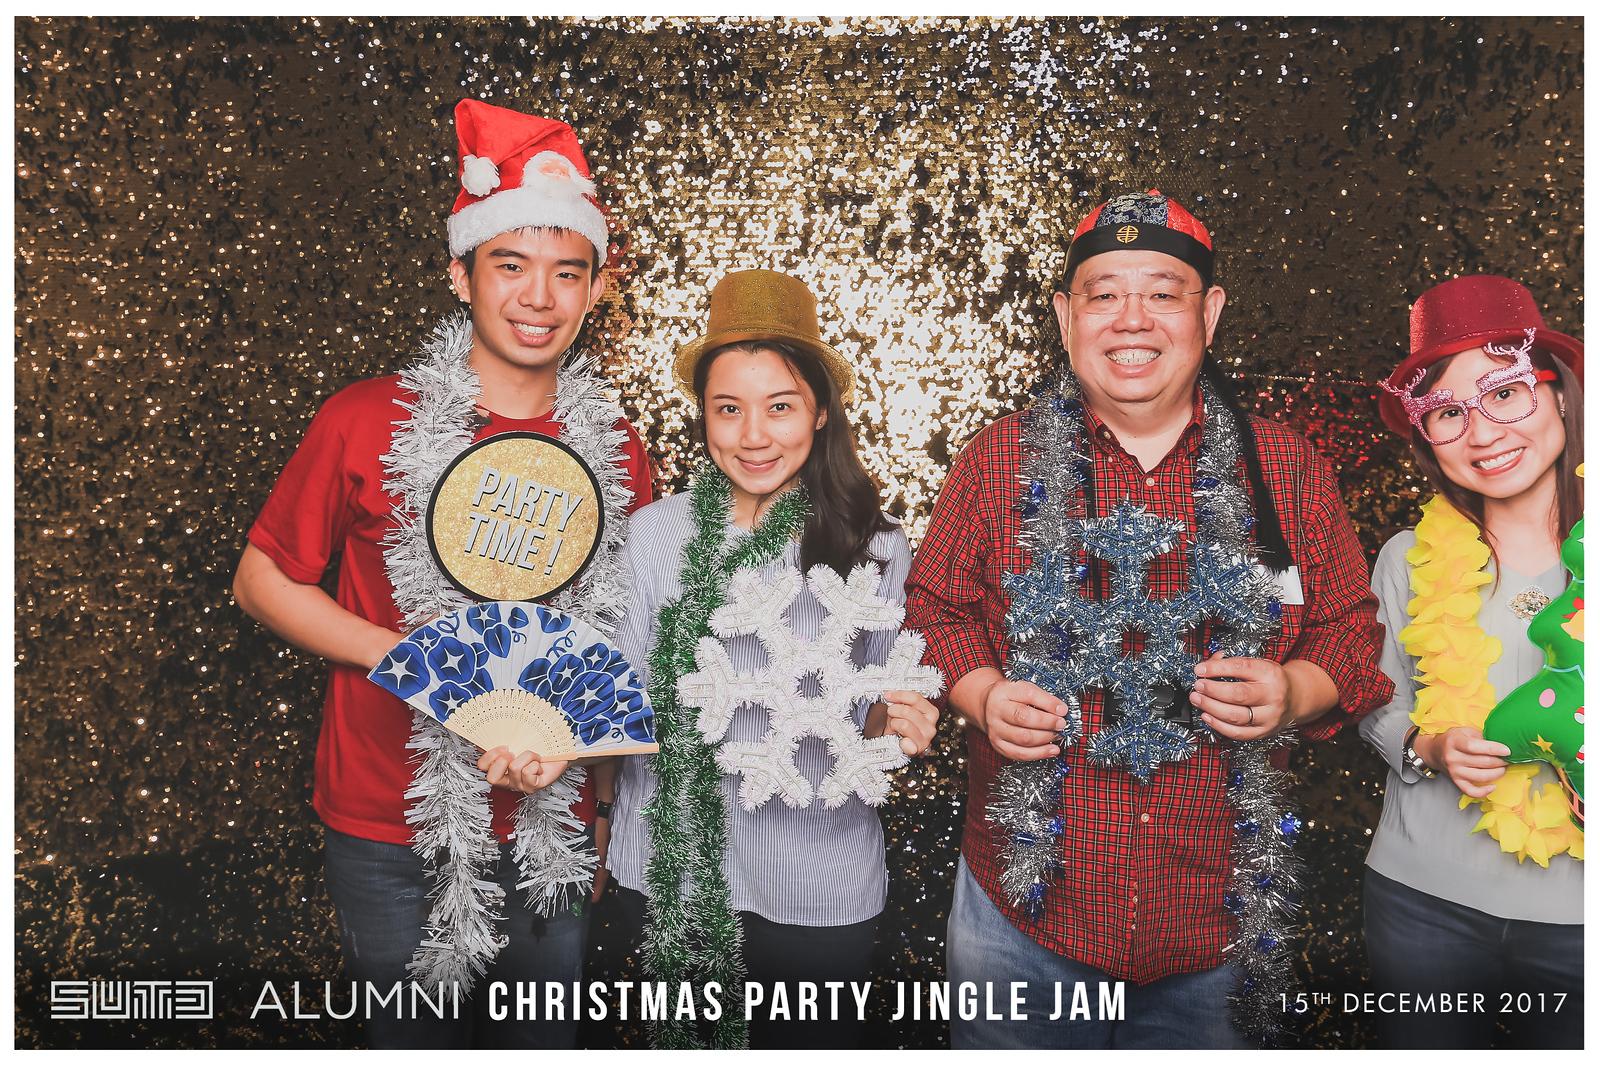 SUTD Christmas Party Jingle Jam 2017 | © www.SRSLYPhotobooth.sg